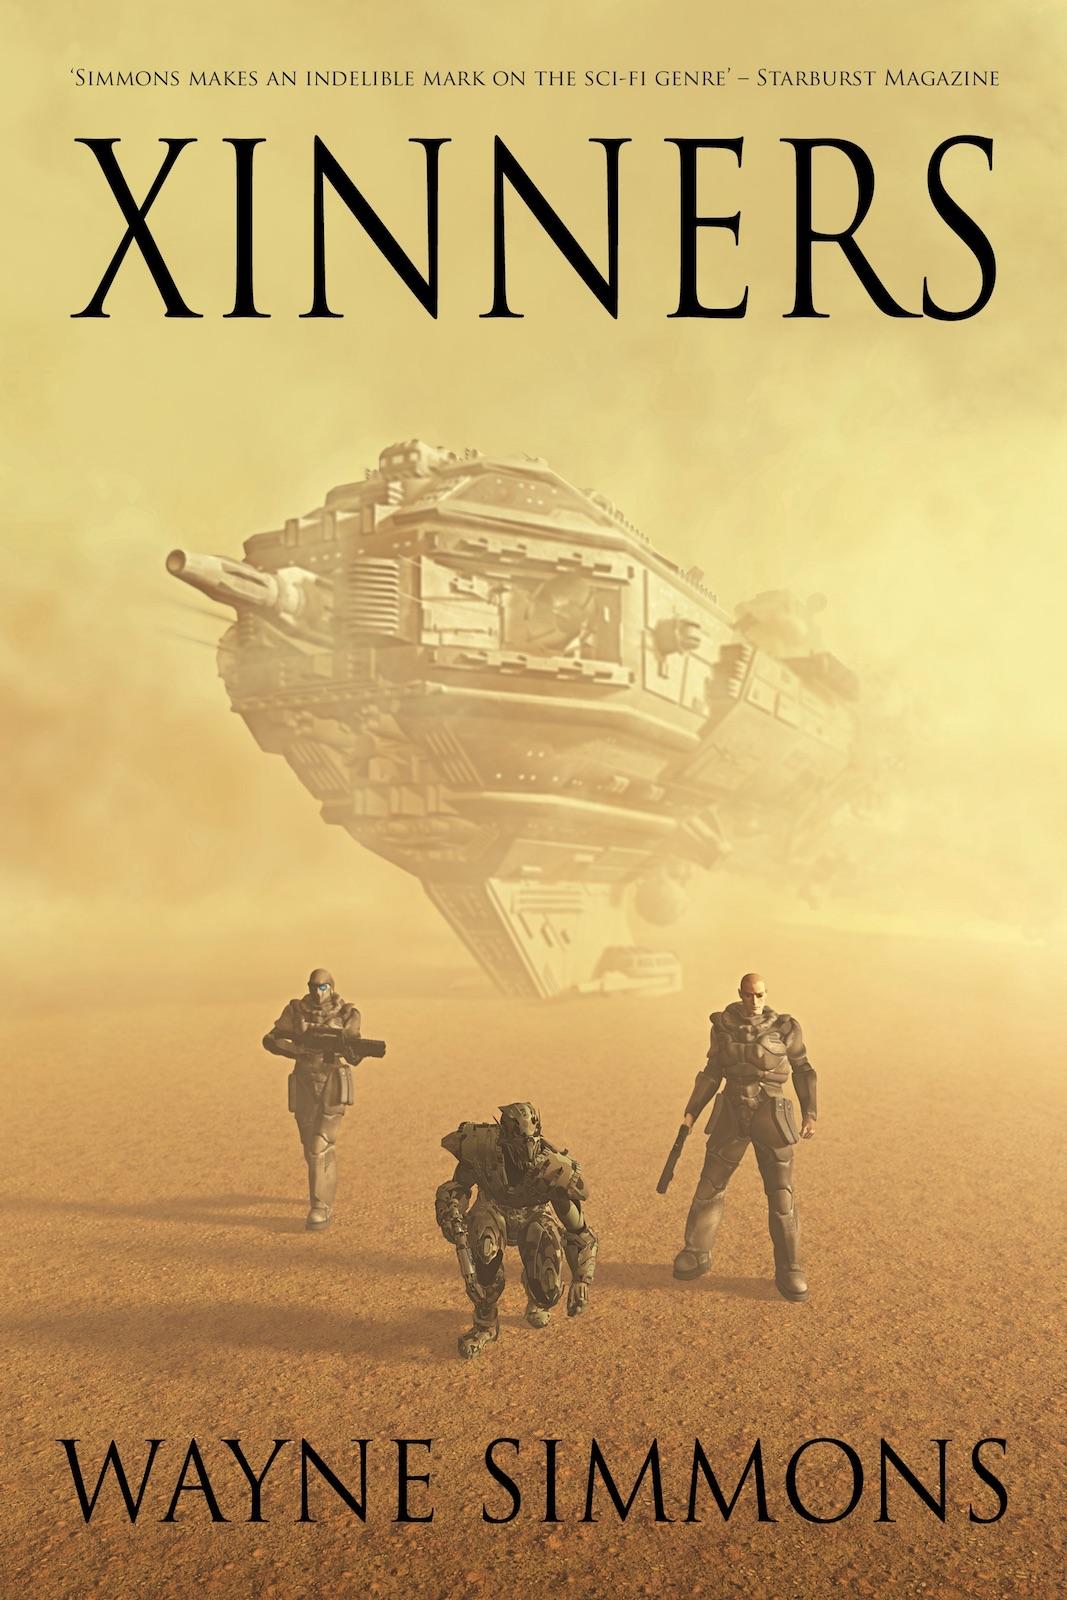 Xinners by Wayne Simmons